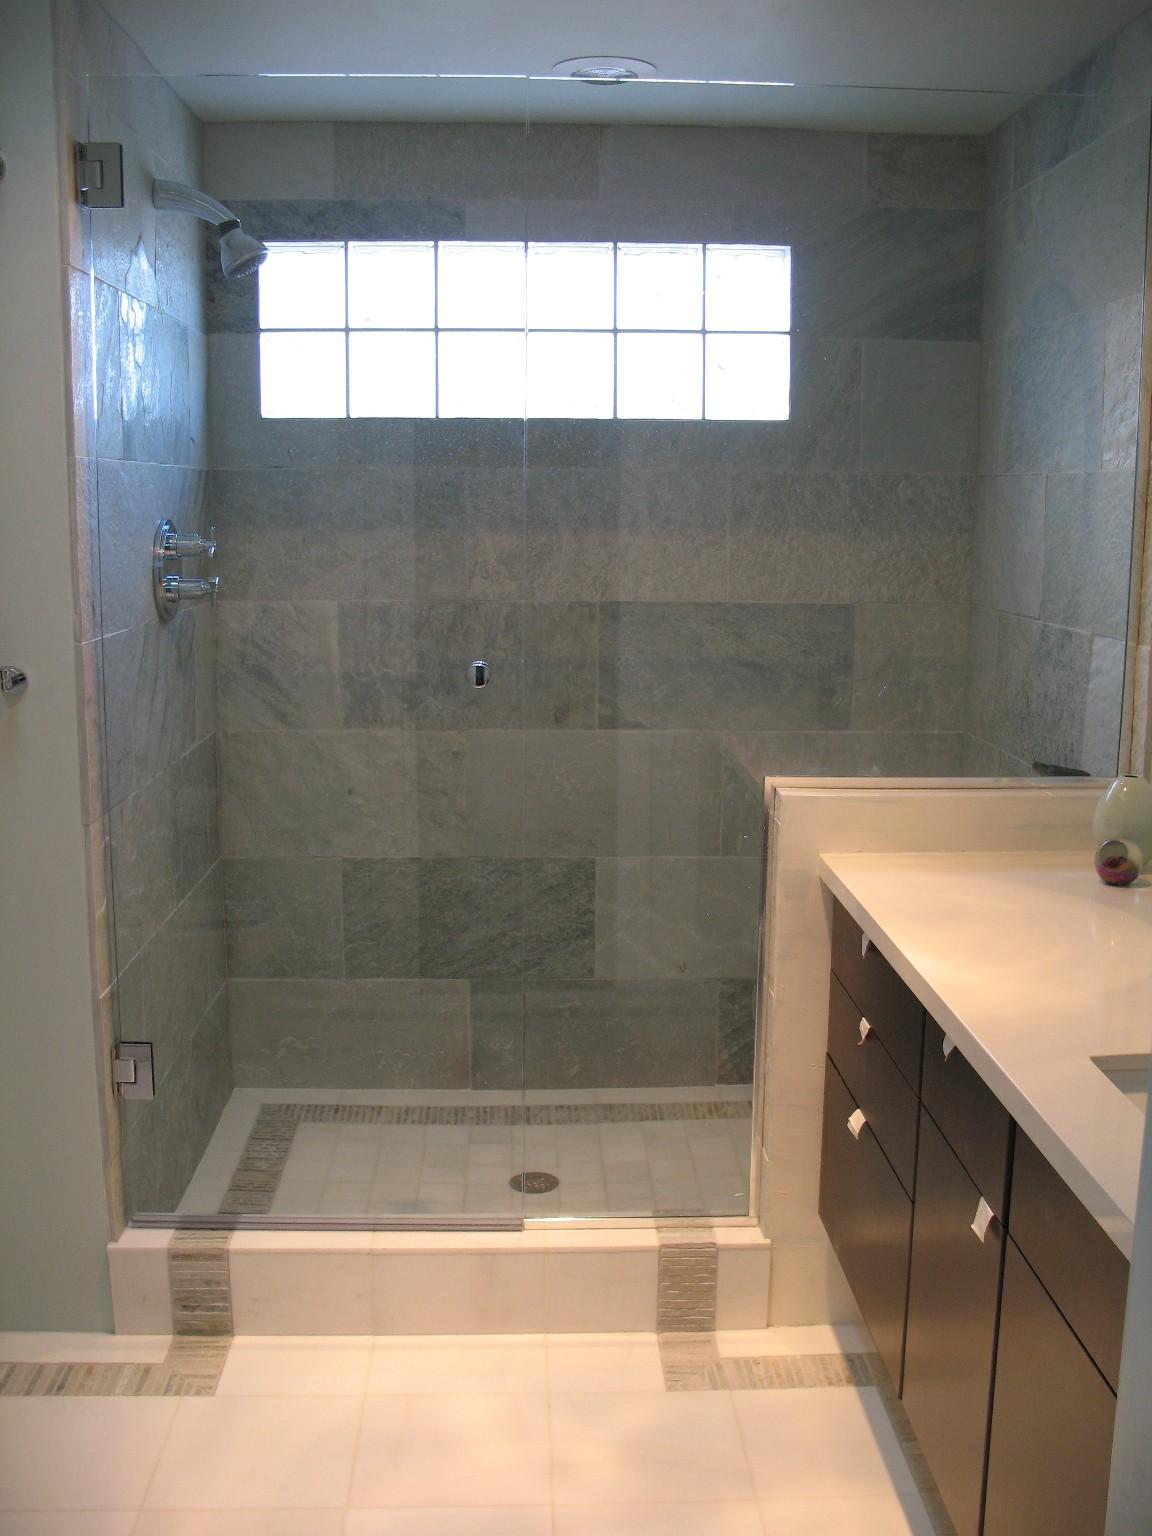 Tile shower pictures ideas in 2013 bathroom designs ideas for Bathroom ideas 2013